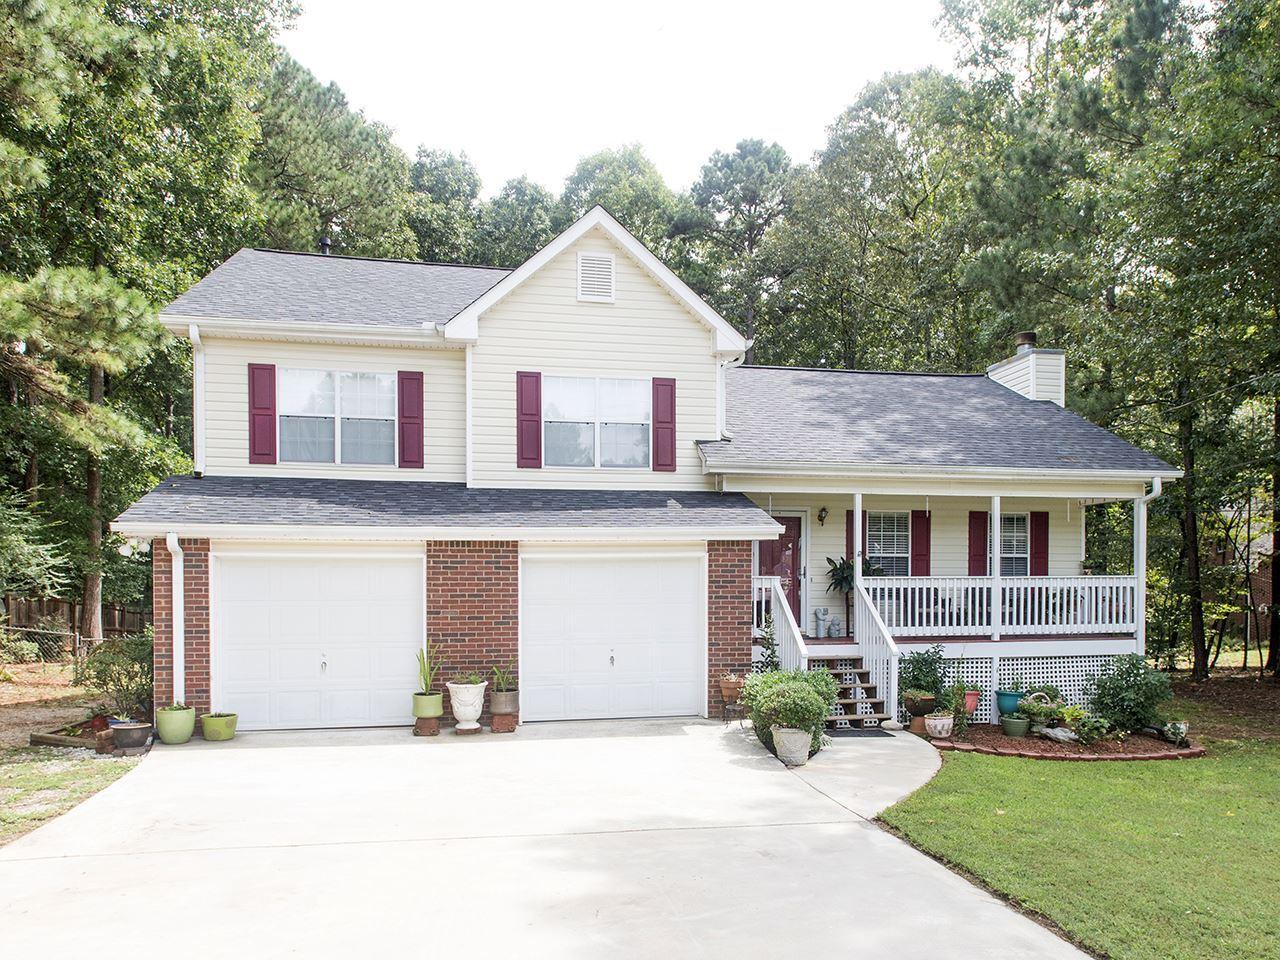 575 Robin Rd, Covington, GA 30016 - #: 8860197